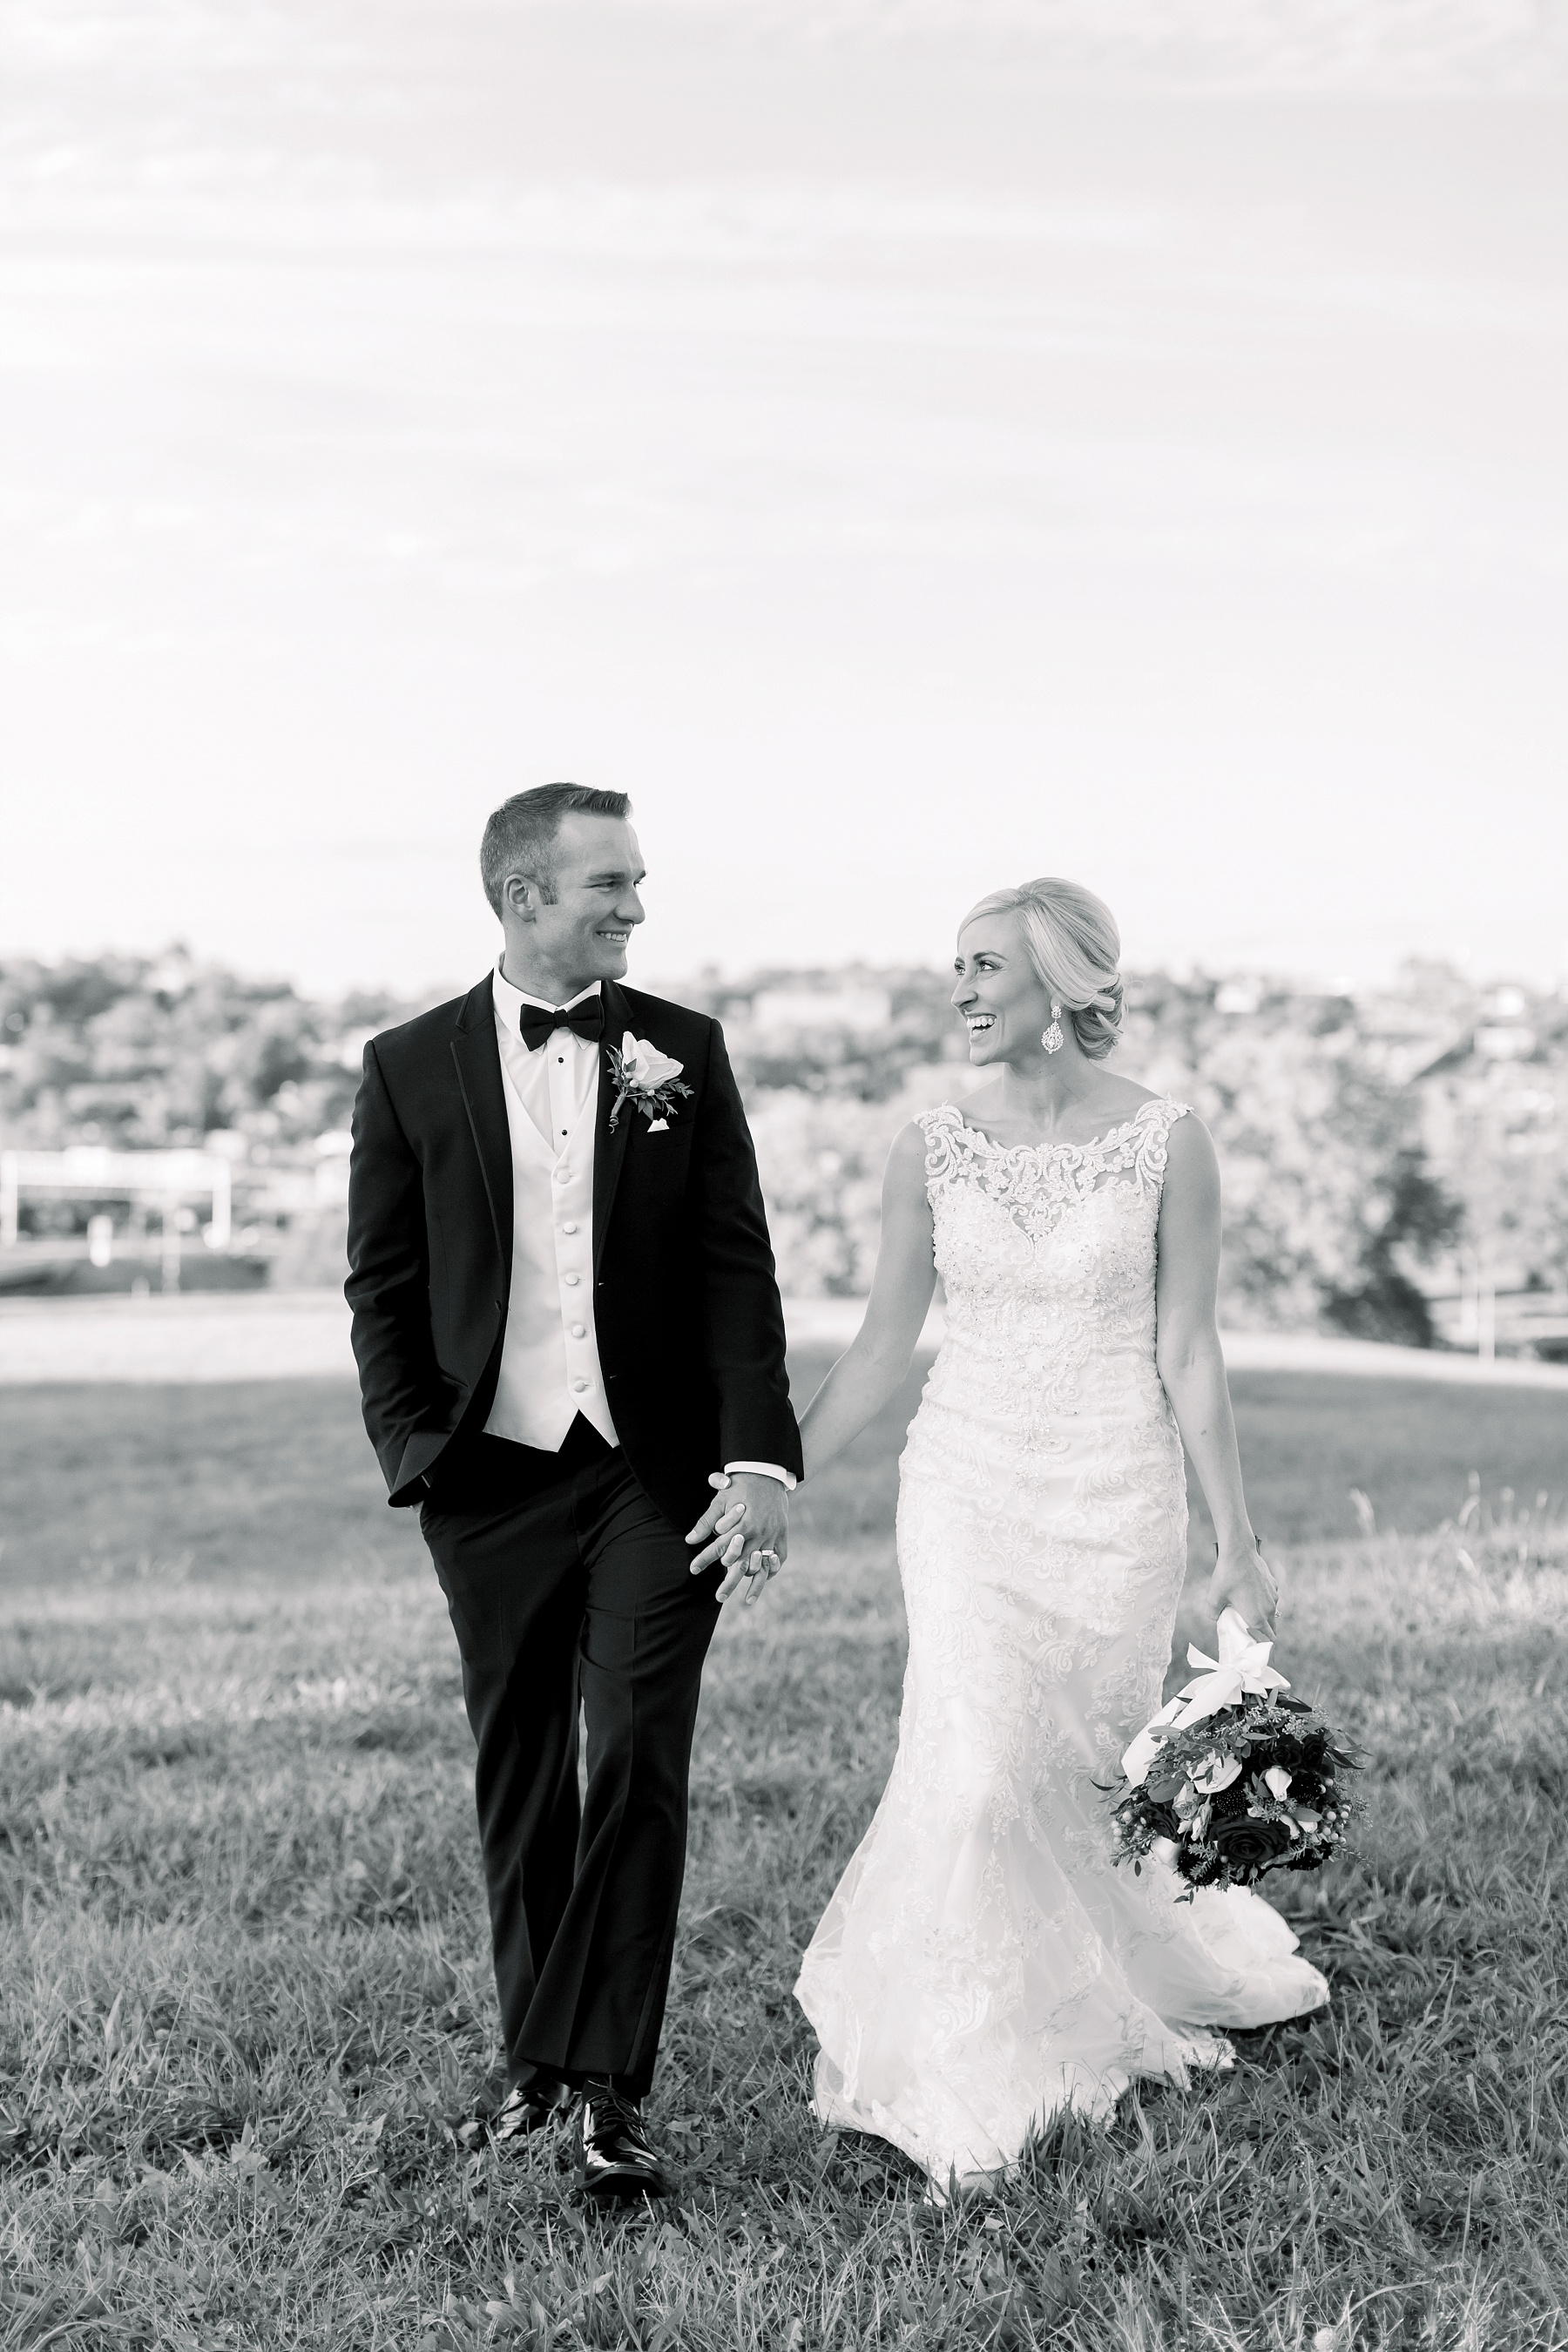 midwest-adventurous-wedding-photographer-elizabeth-ladean-photography-photo_4796.jpg